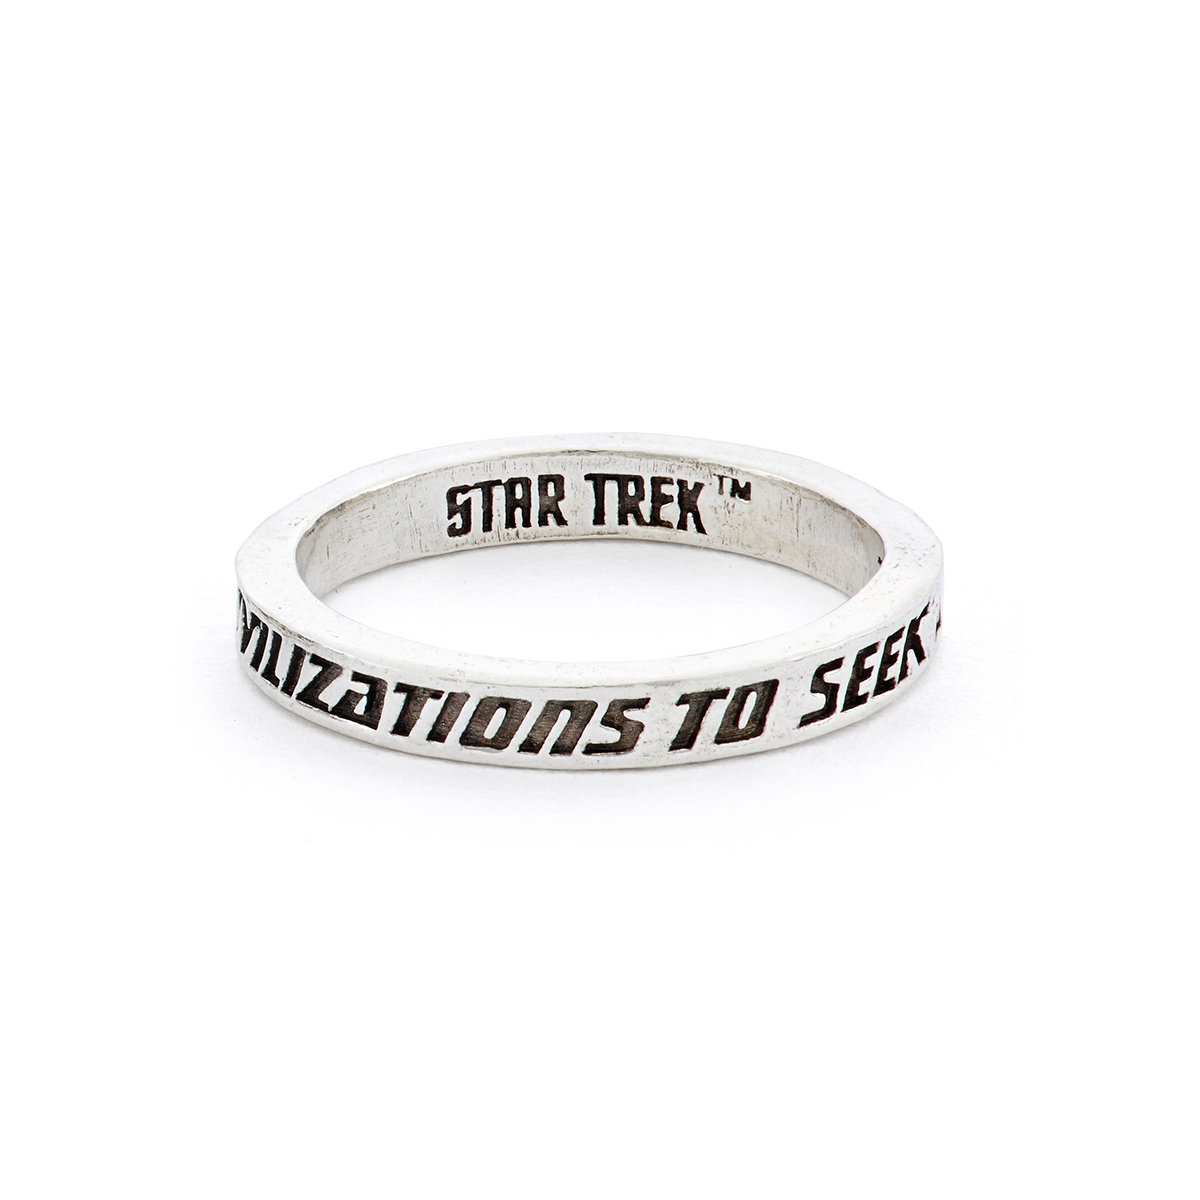 Star Trek x RockLove Sterling Intro Stacker Ring - To Seek